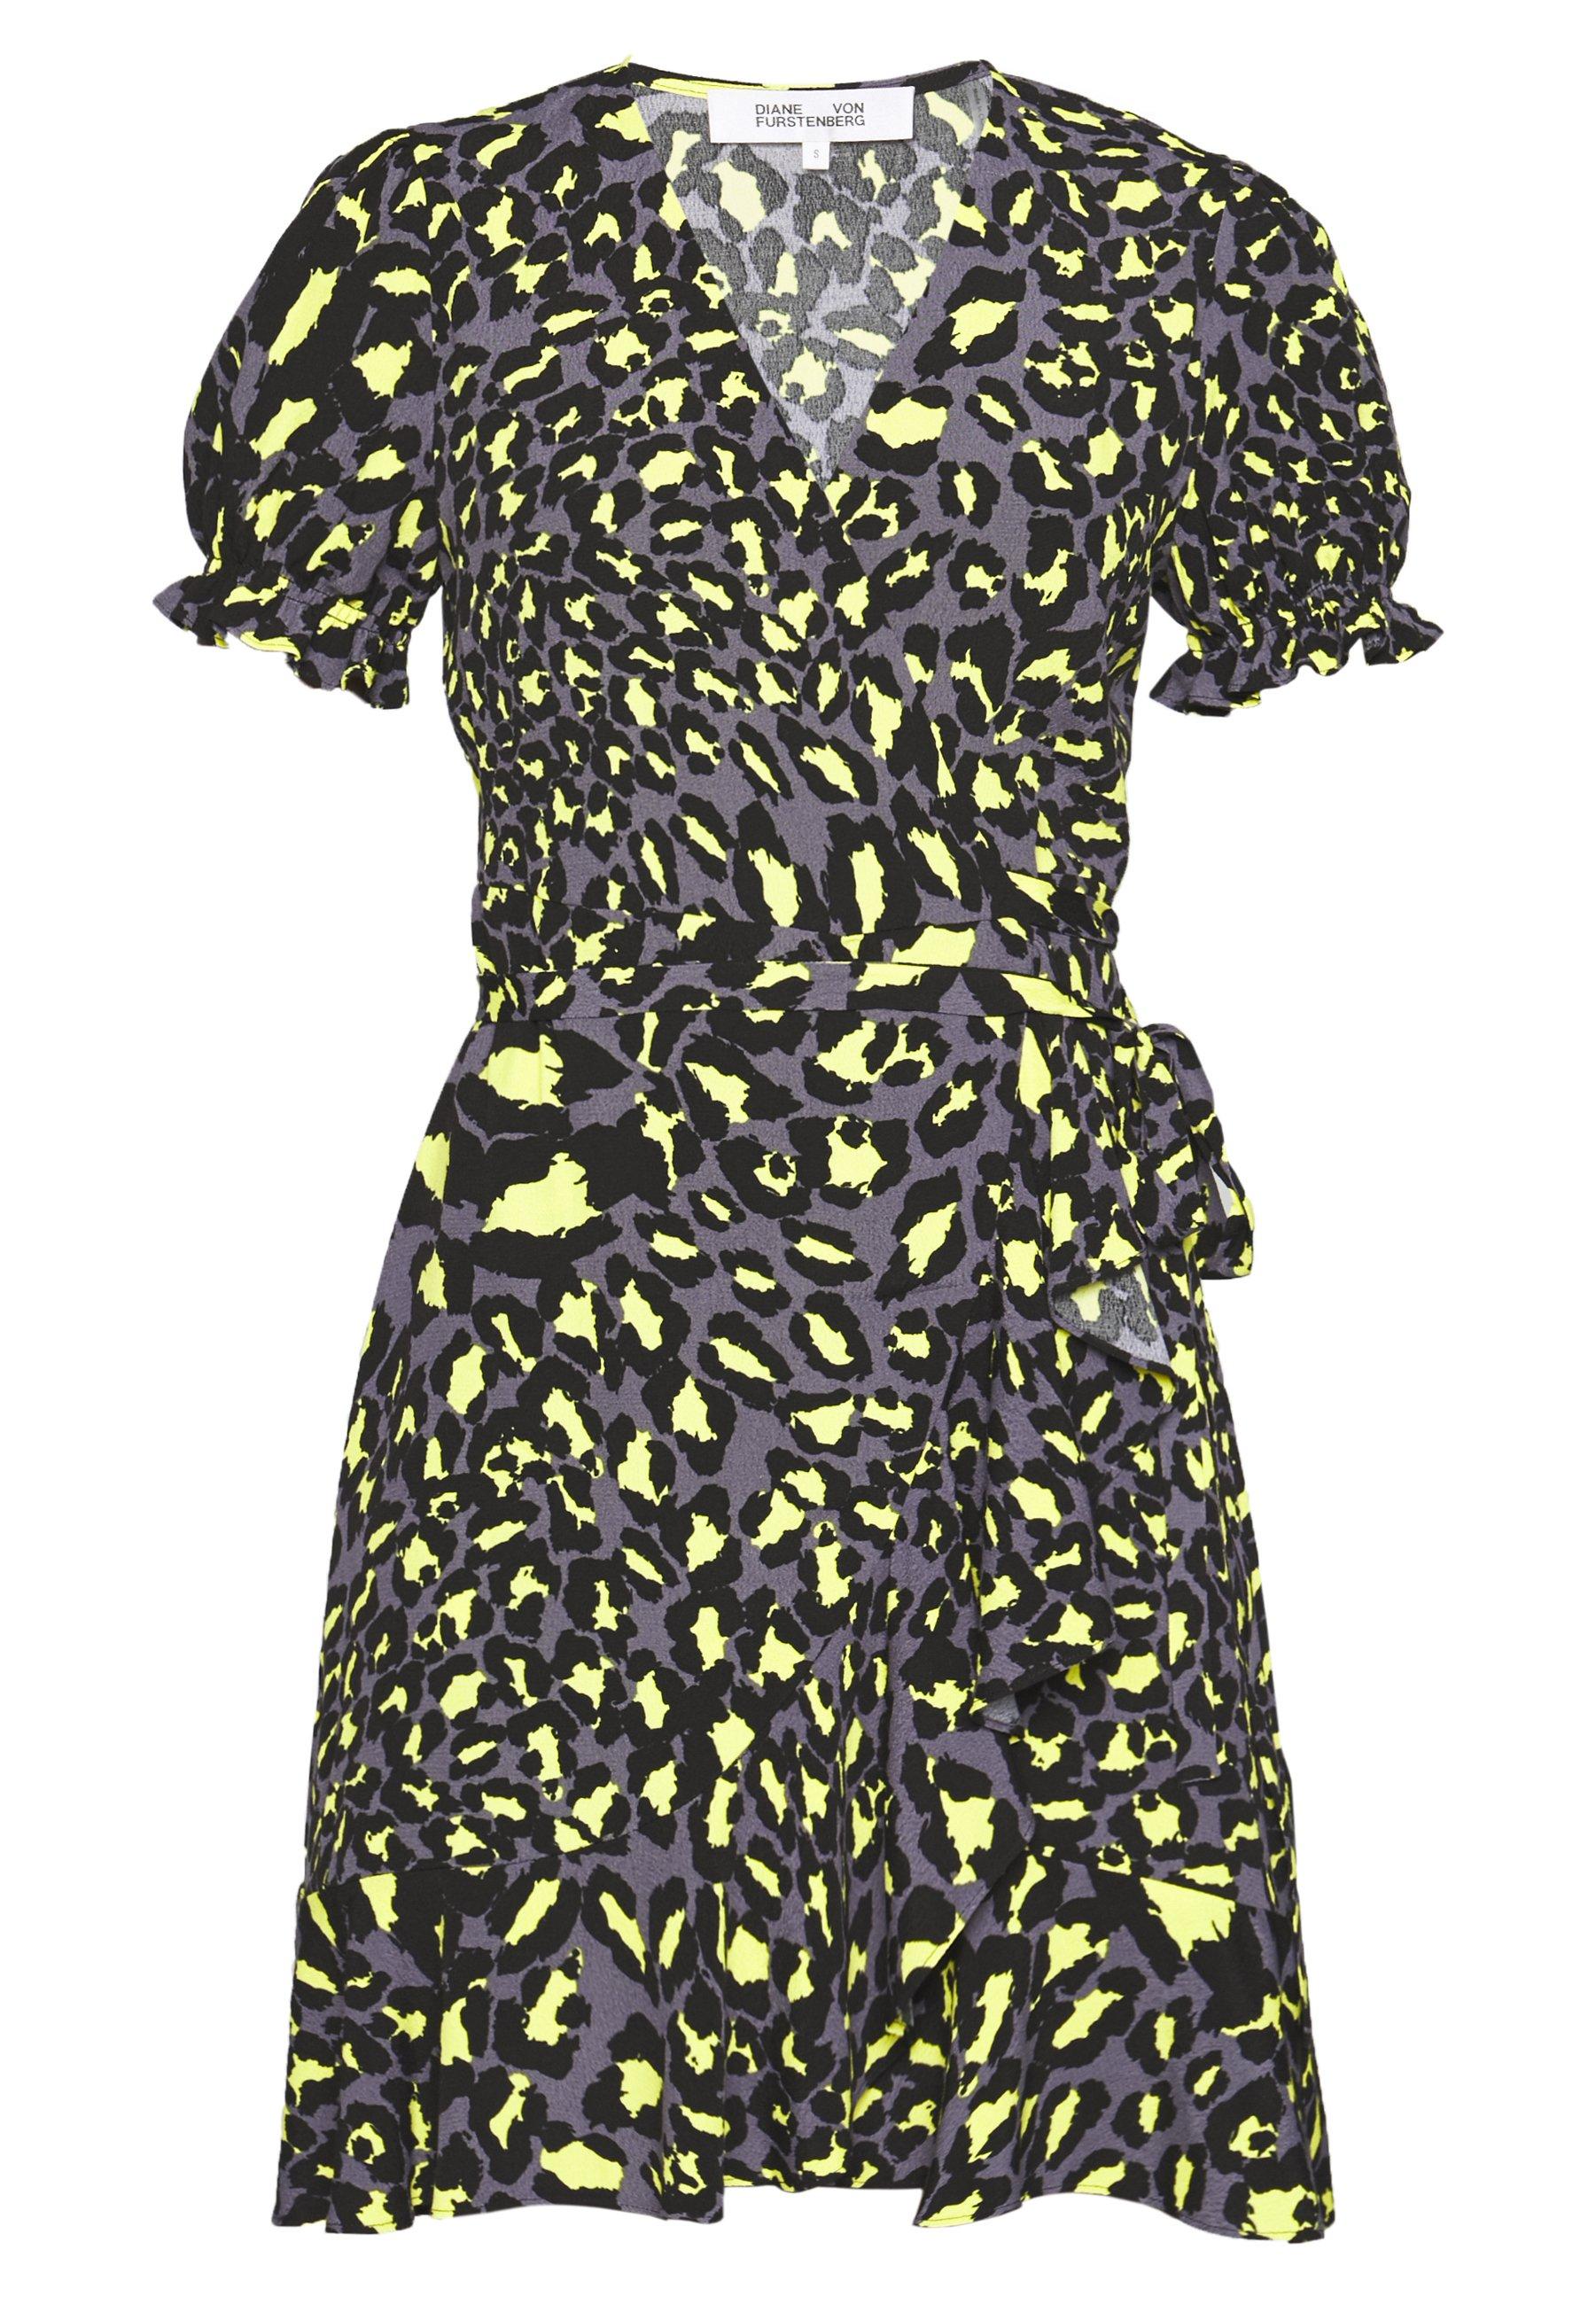 Diane Von Furstenberg Emilia - Day Dress Multi-coloured/black